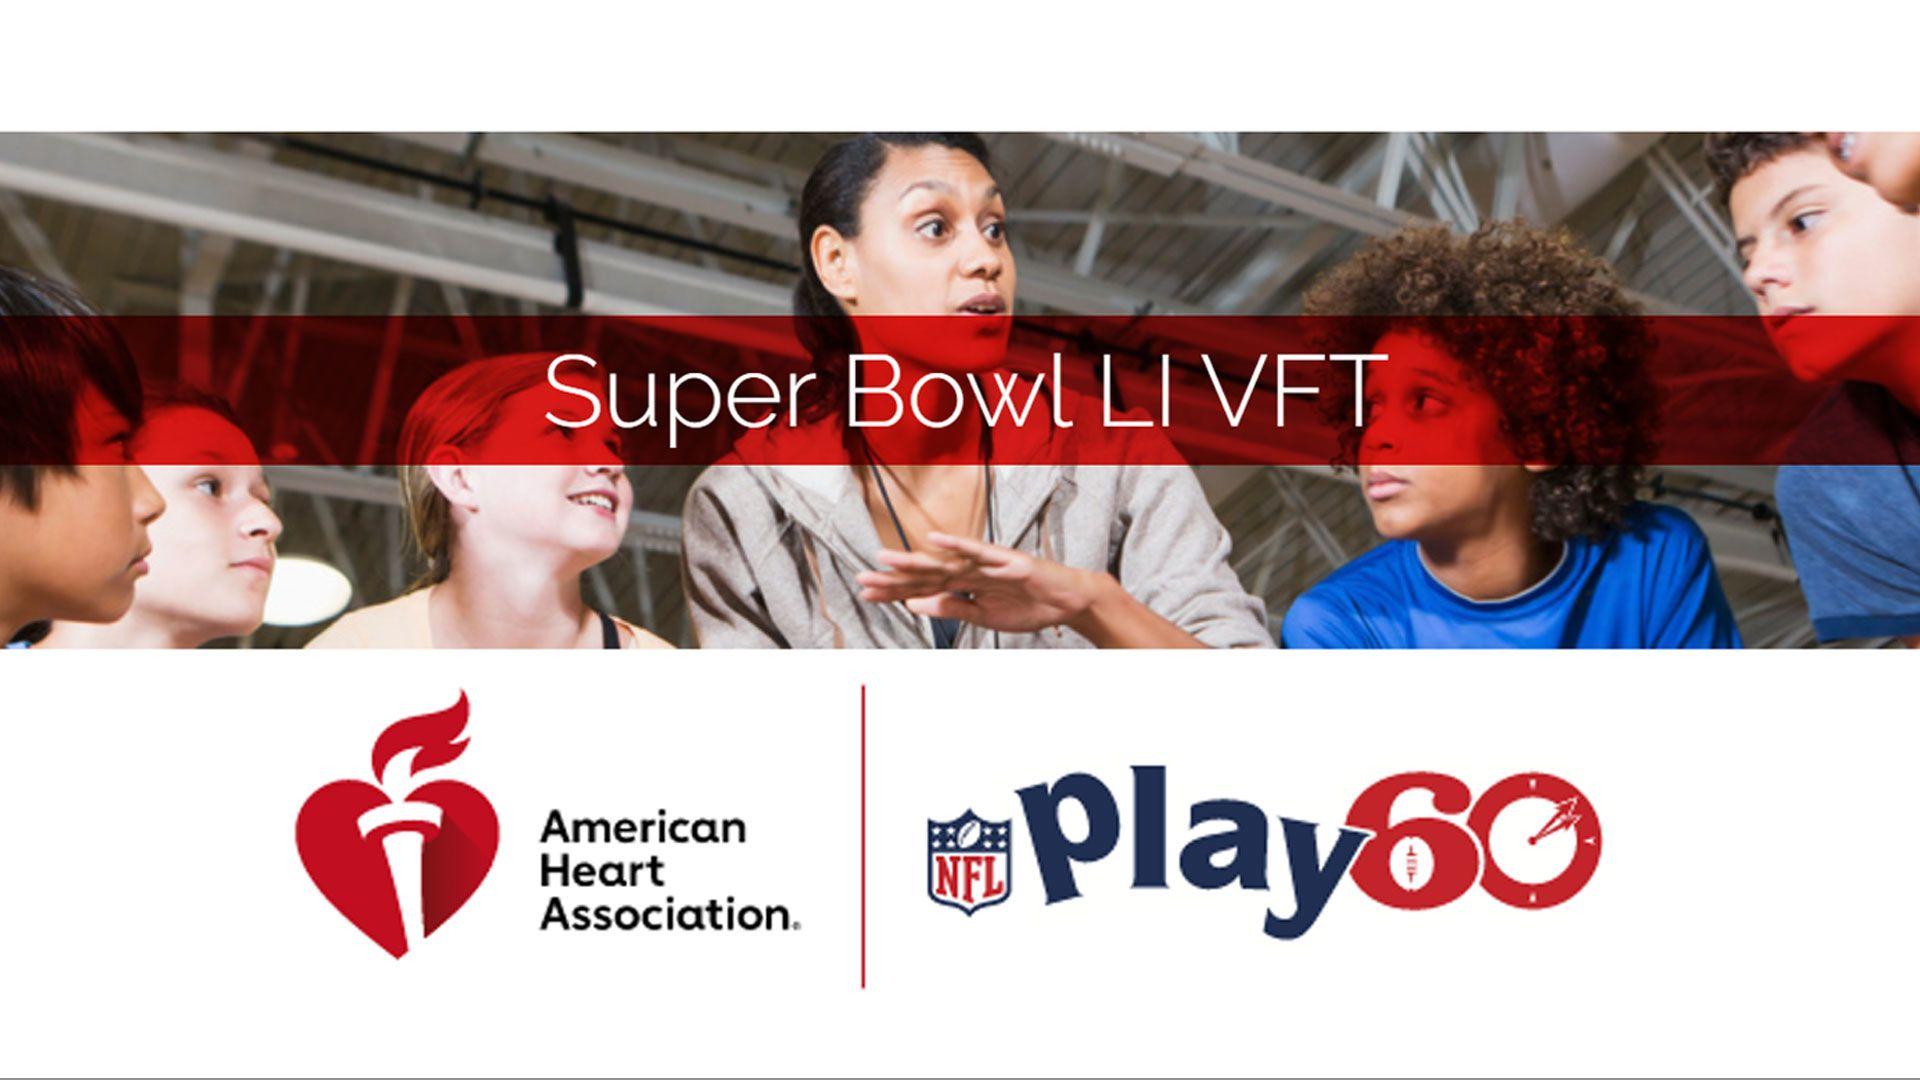 NFL PLAY60 Virtual Field Trip